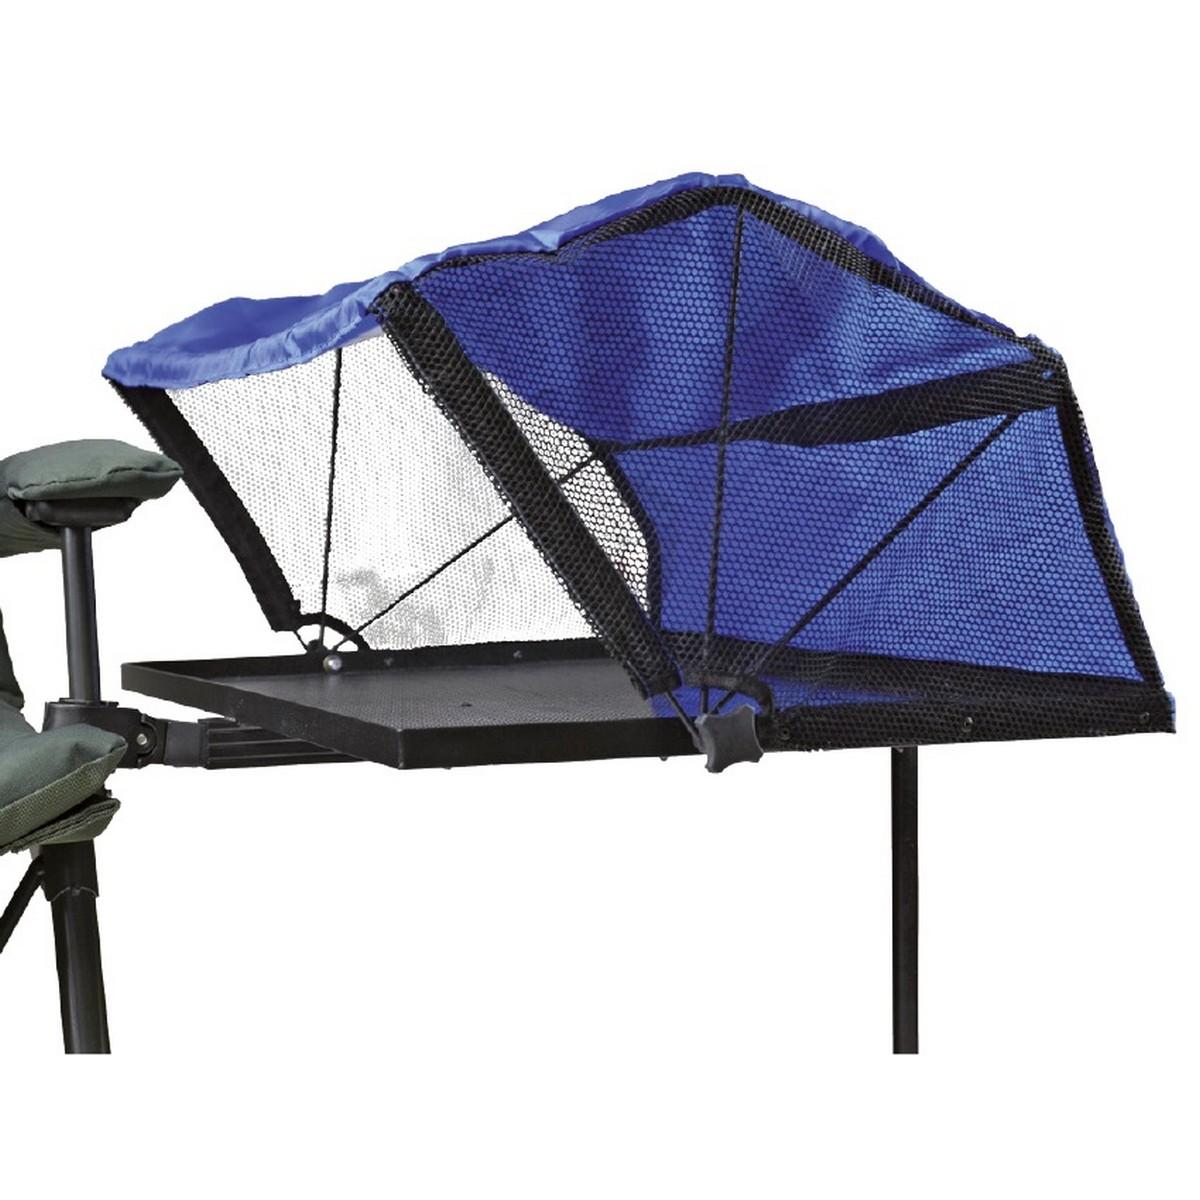 Прикачно за платформа CZ Feeder Competition Side Tray - скара с покривало